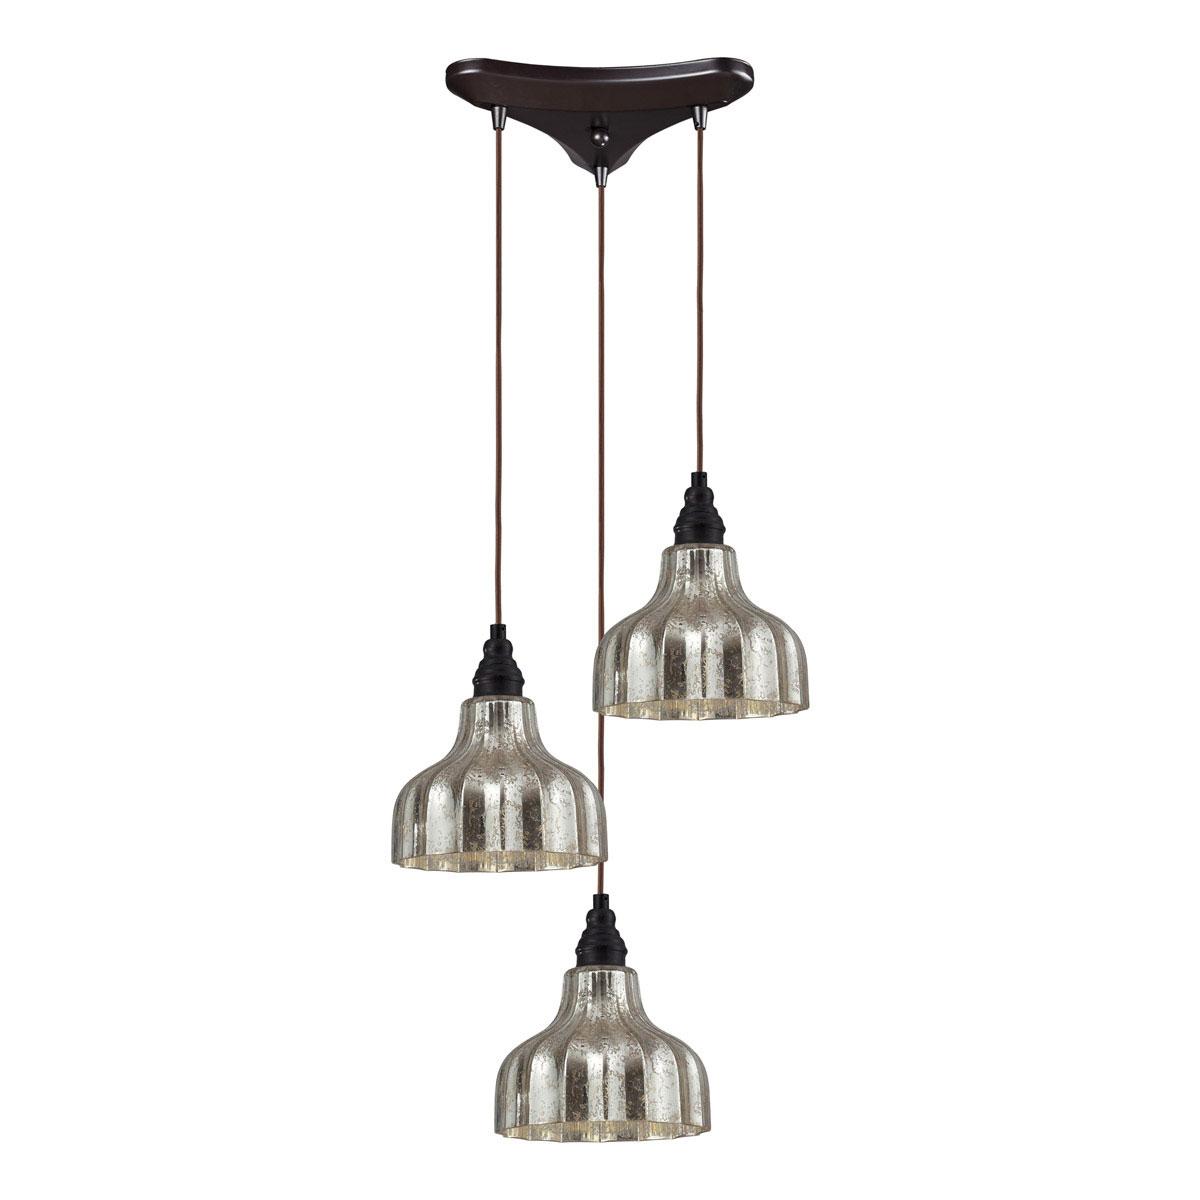 Elk Lighting Amazon: Danica 46008 Multi Pendant By Elk Lighting